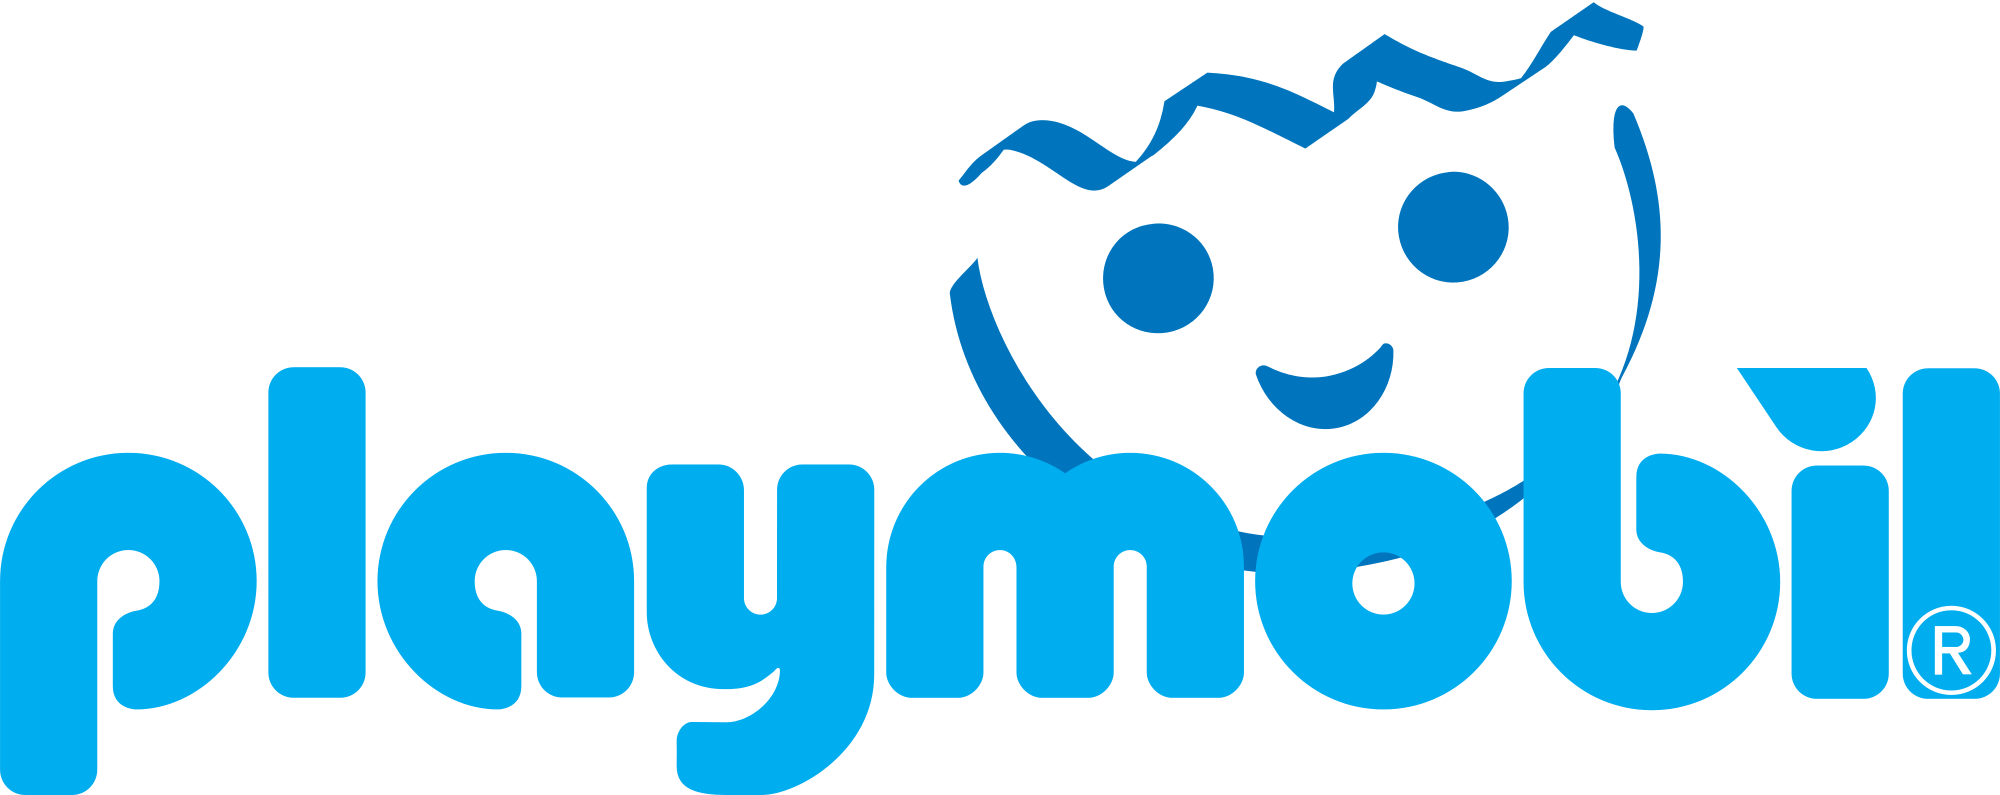 2000px-Playmobil_logo.svg